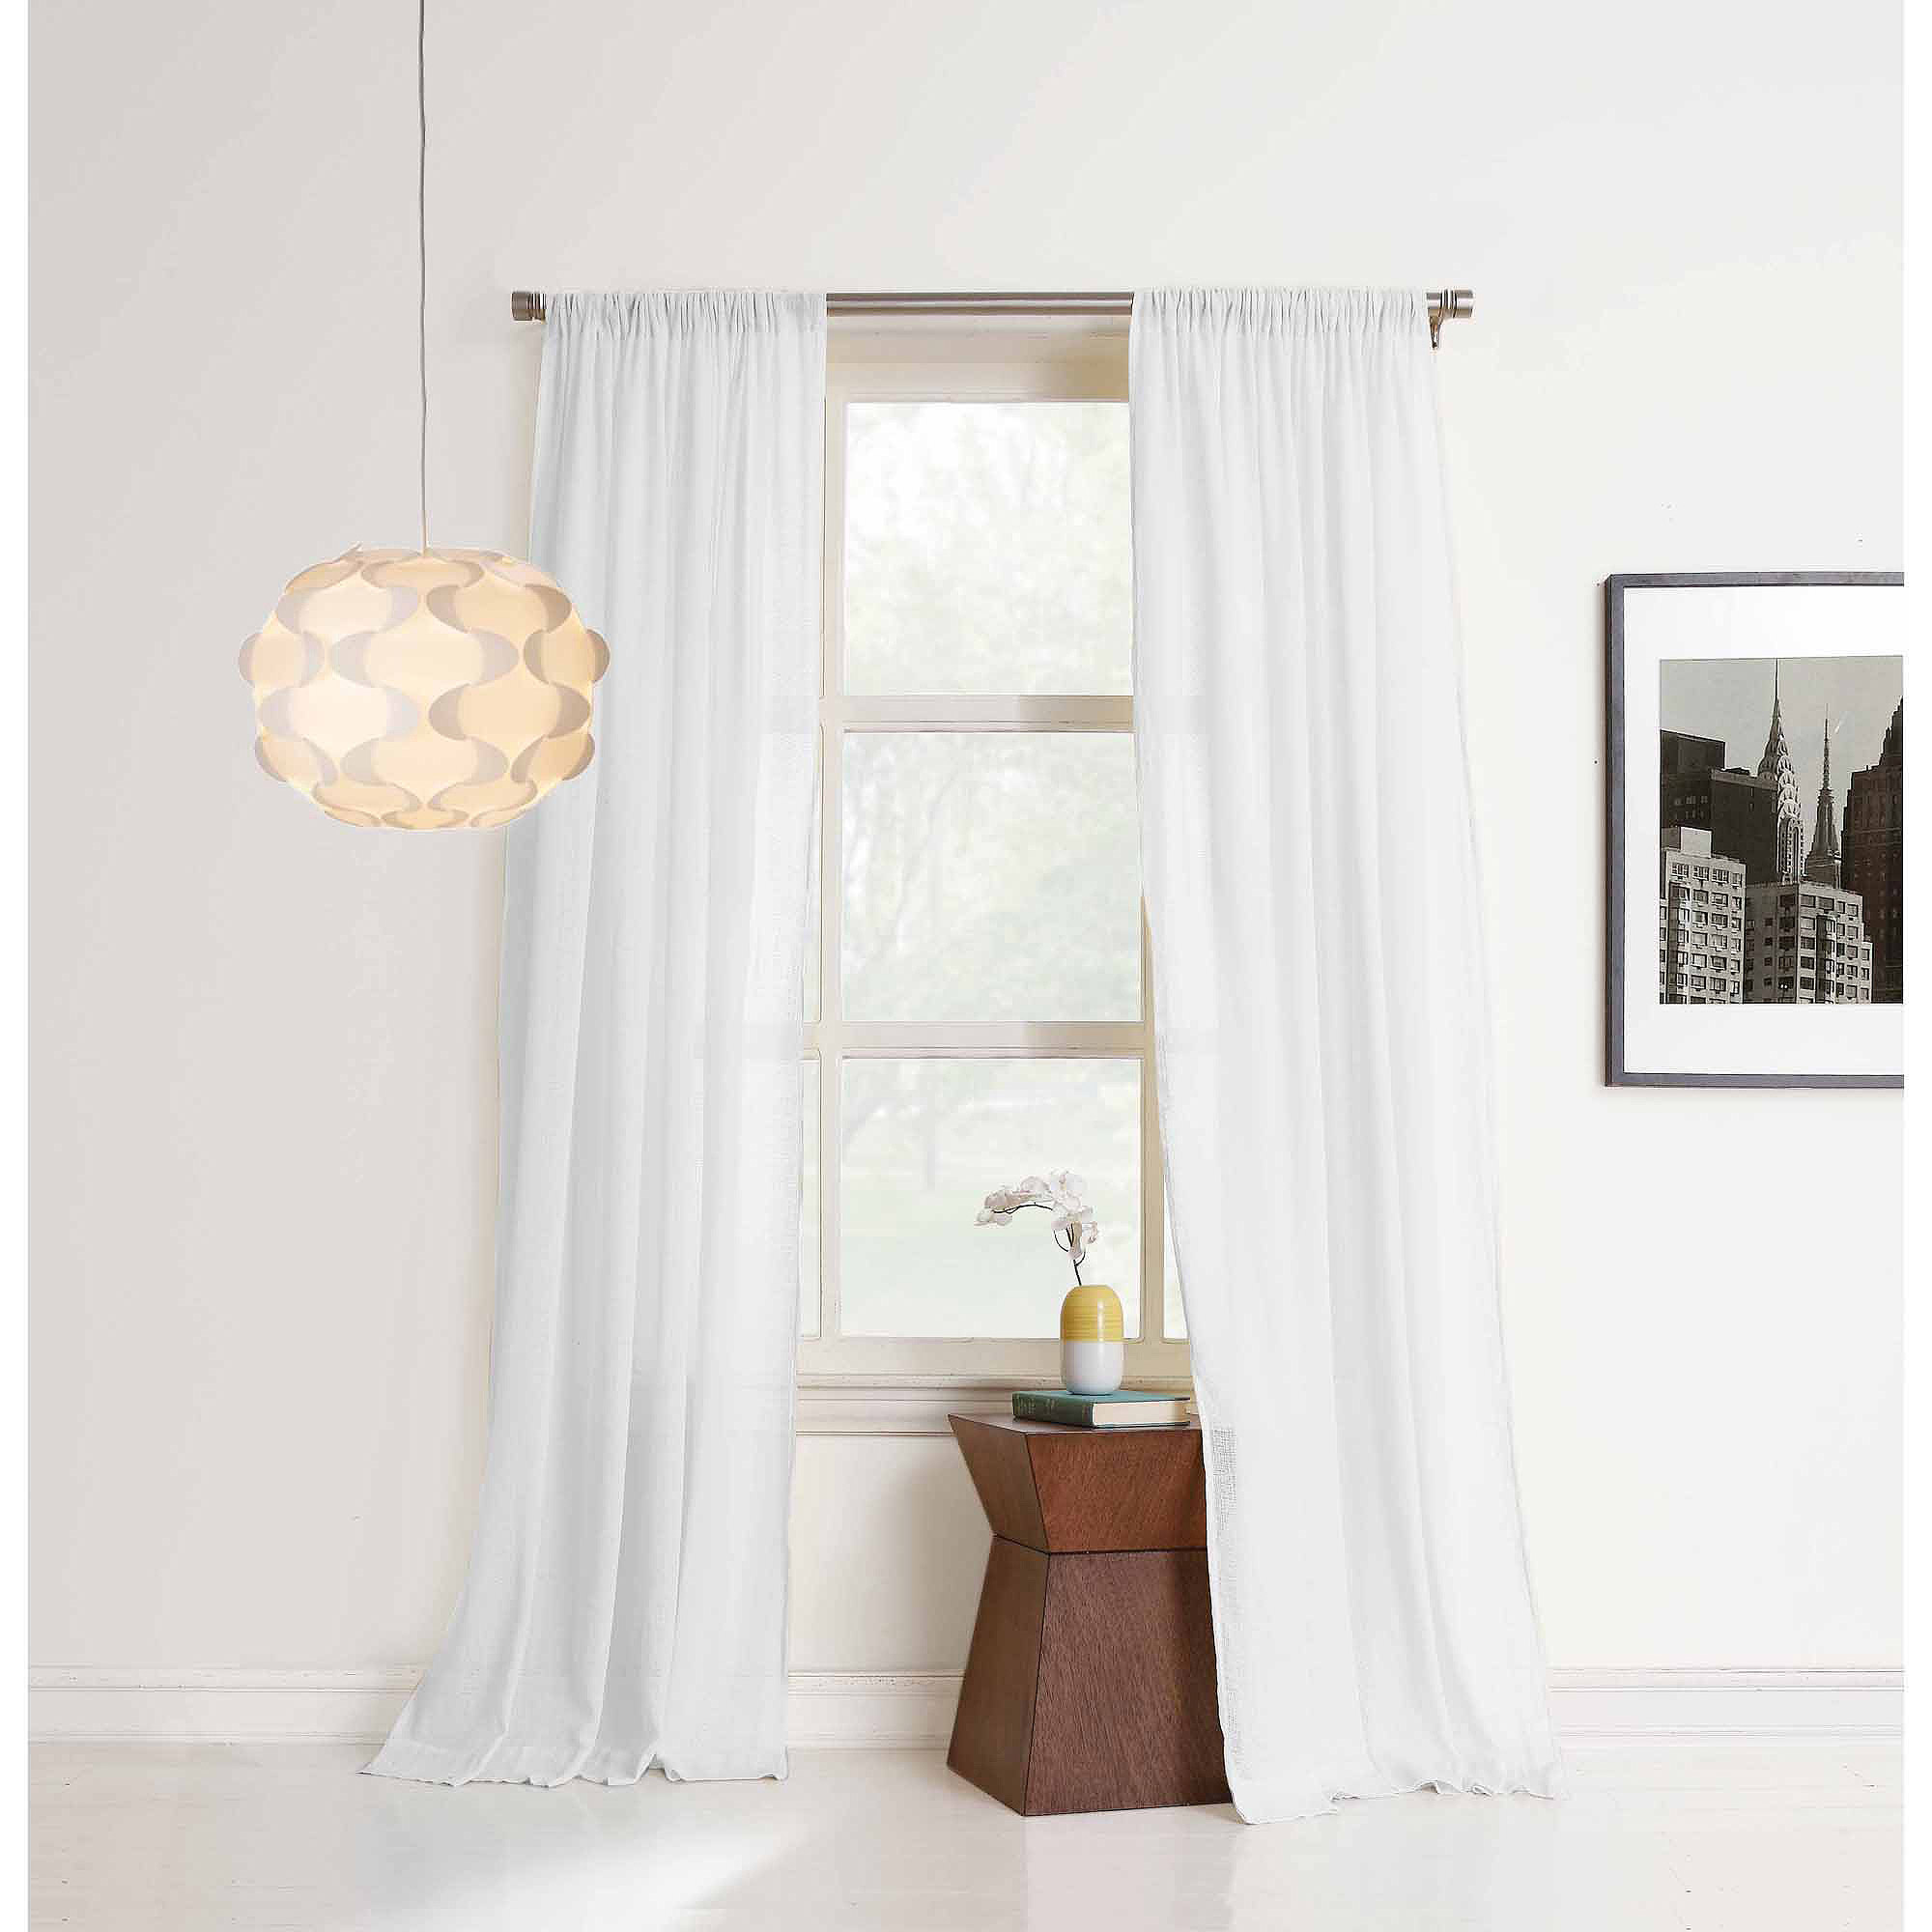 No. 918 Brayden Cotton Gauze Curtain Panel